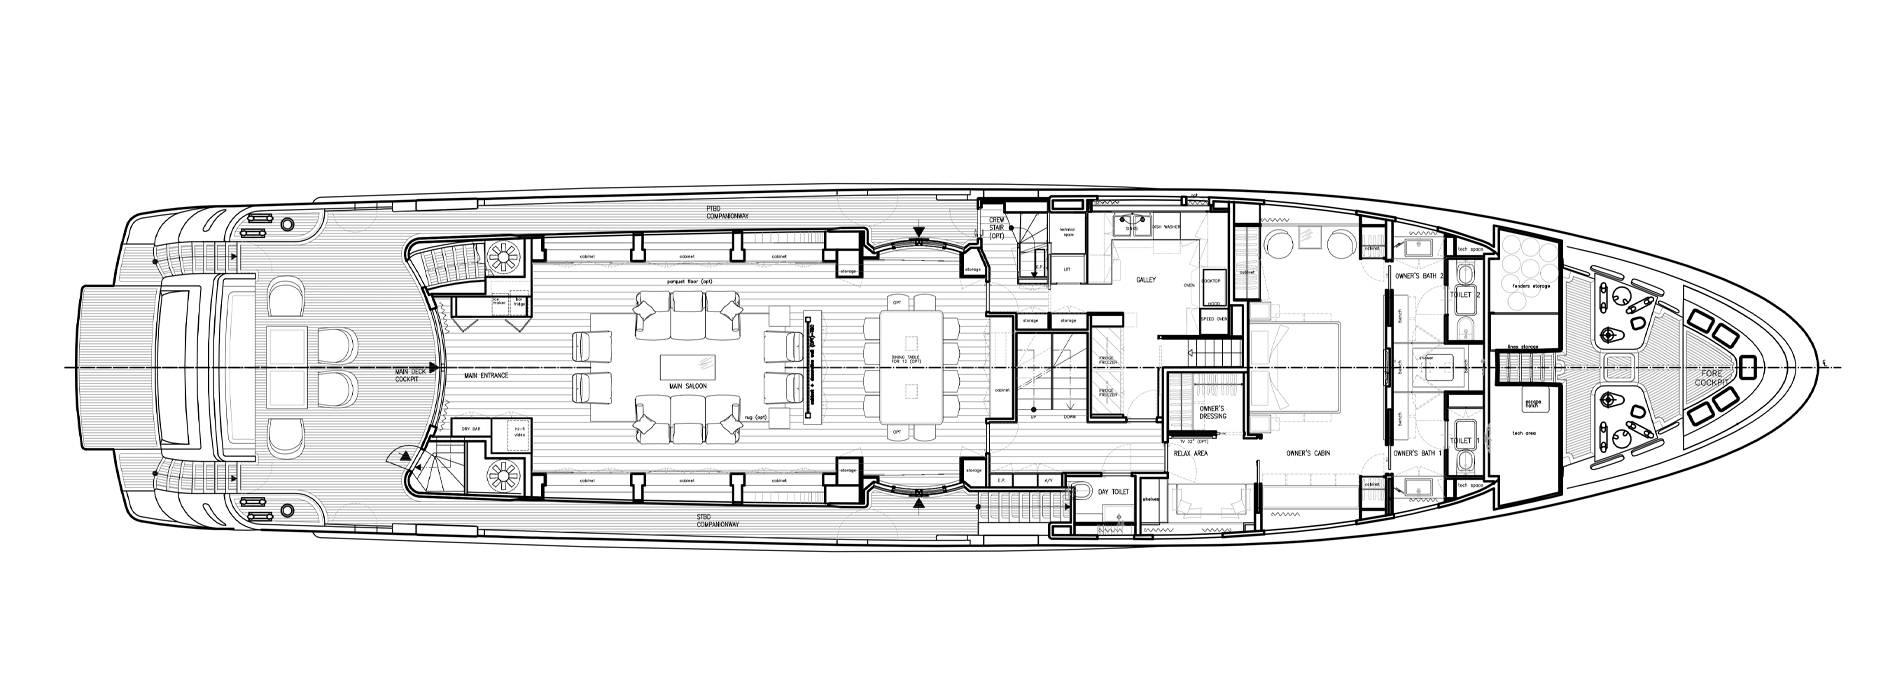 Sanlorenzo Yachts SD122-27 under offer Cubierta principal